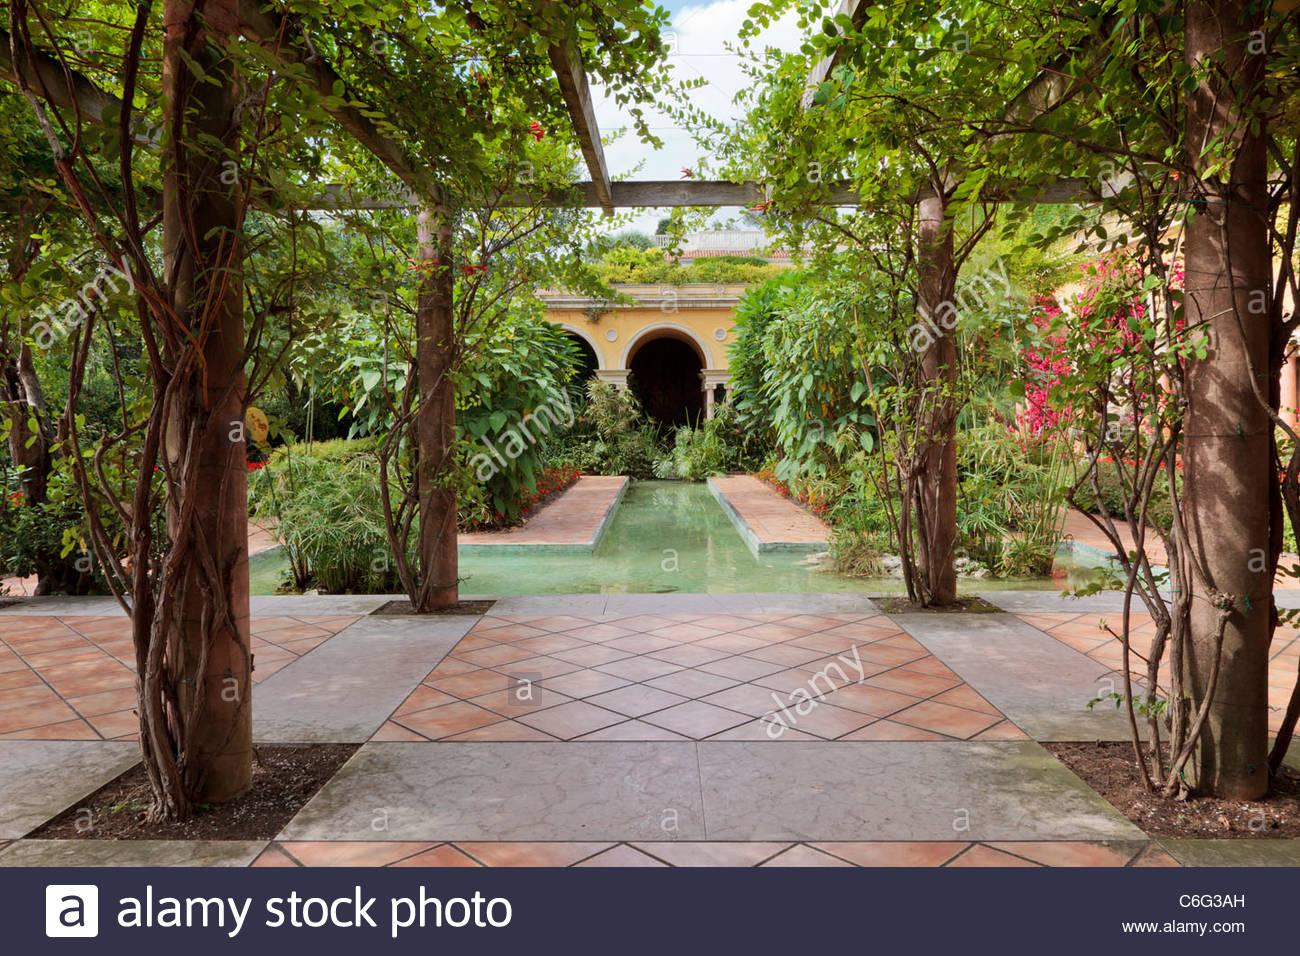 The Spanish Garden, Villa Ephrussi De Rothschild, Saint Jean Cap Ferrat,  France